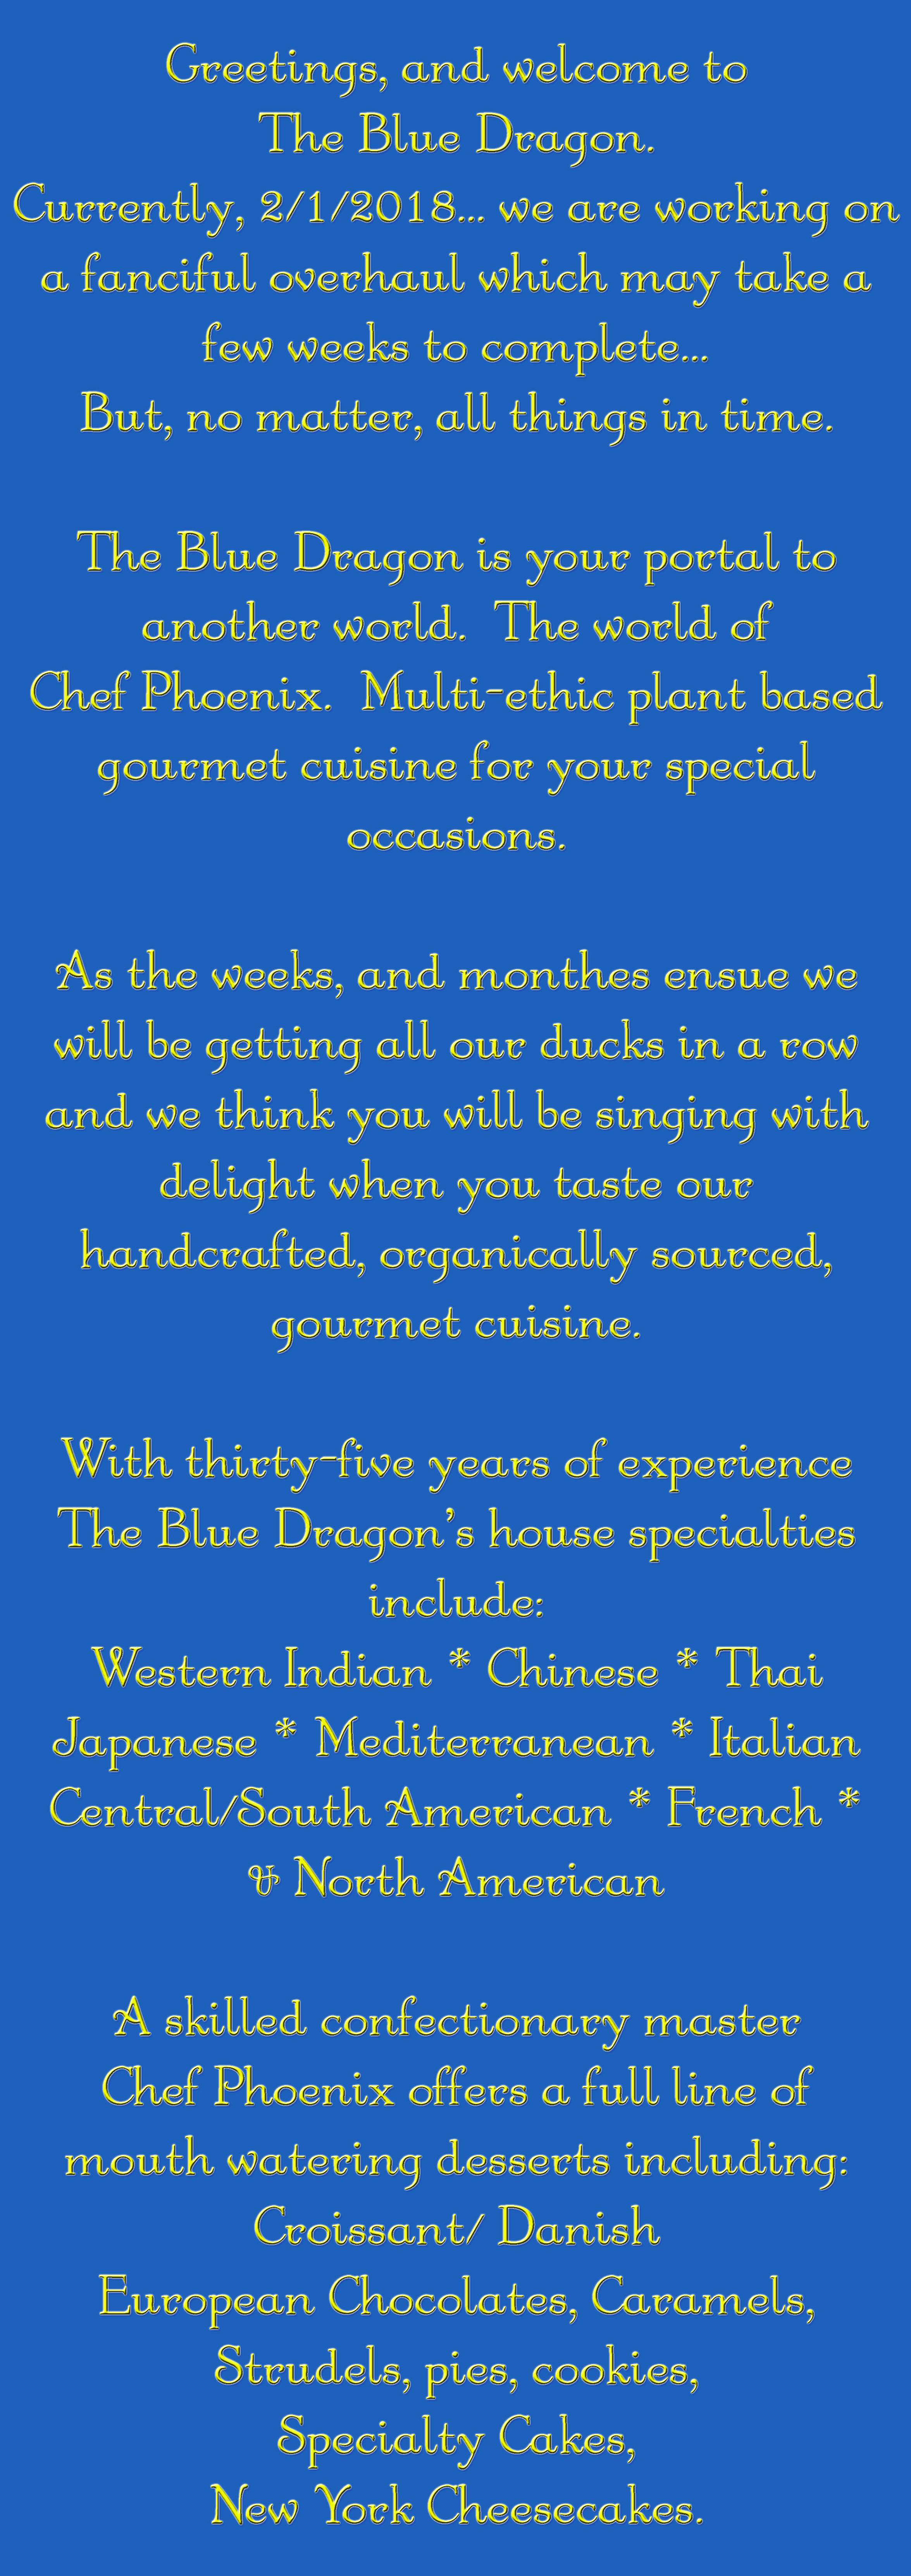 The Blue Dragon Main Portal